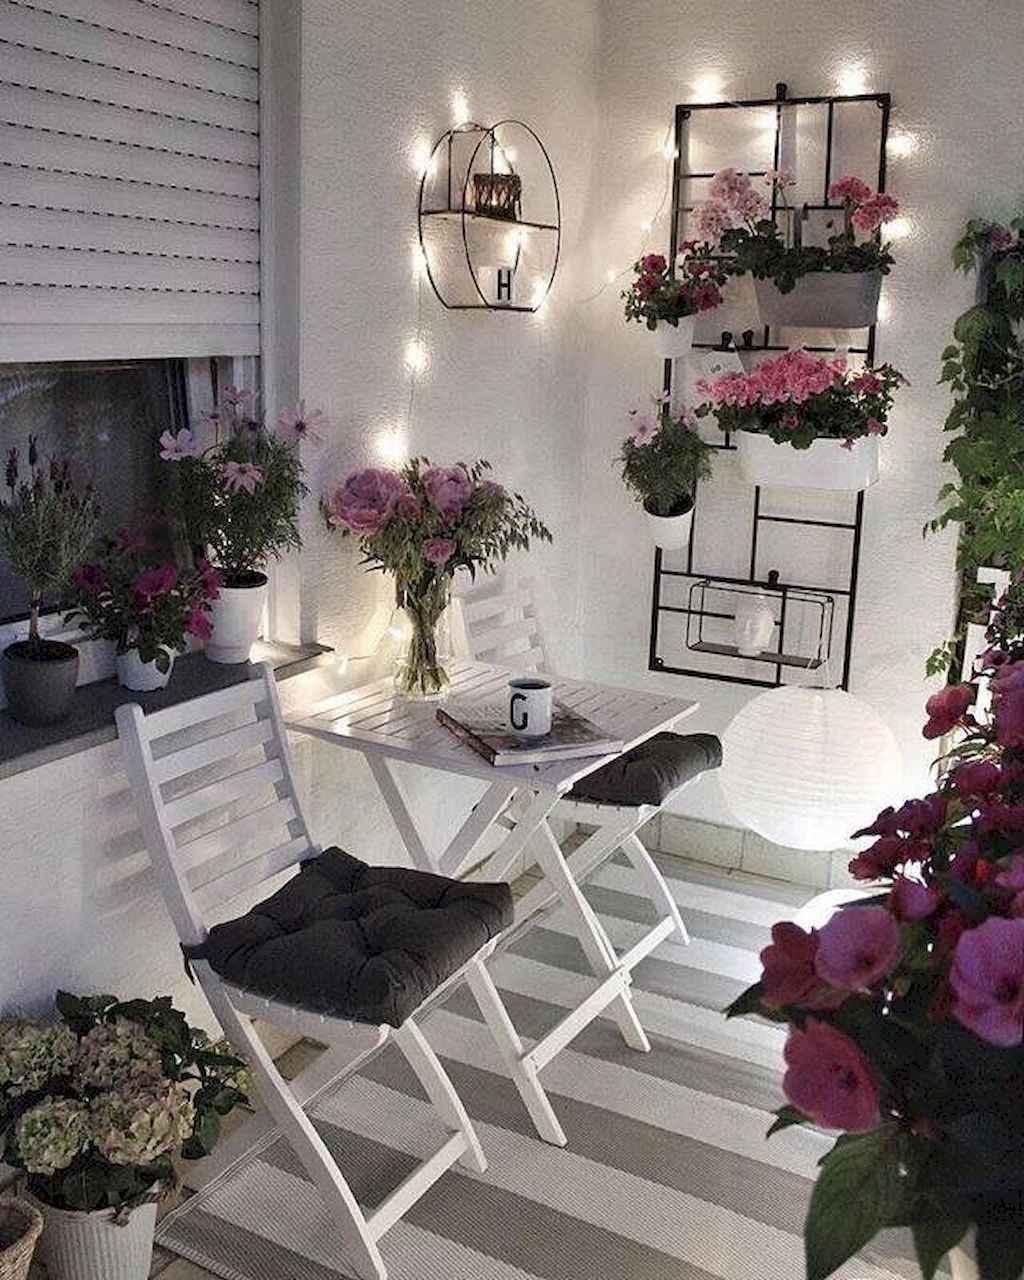 76 Cozy Apartment Balcony Decorating Ideas